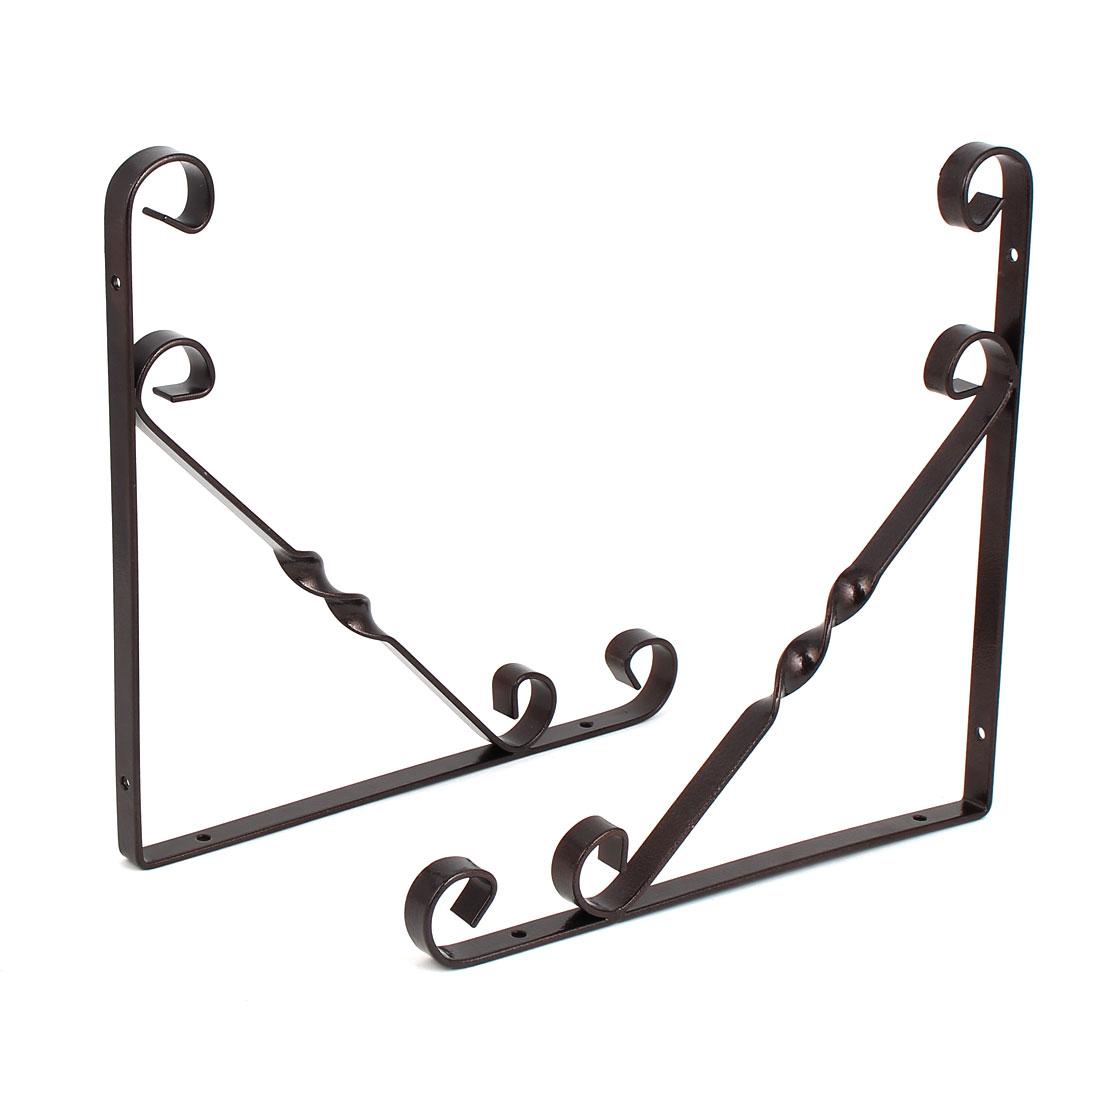 Home Shop Wall Mounted Metal L Shaped Support Shelf Bracket Copper Tone 250x250mm 2pcs